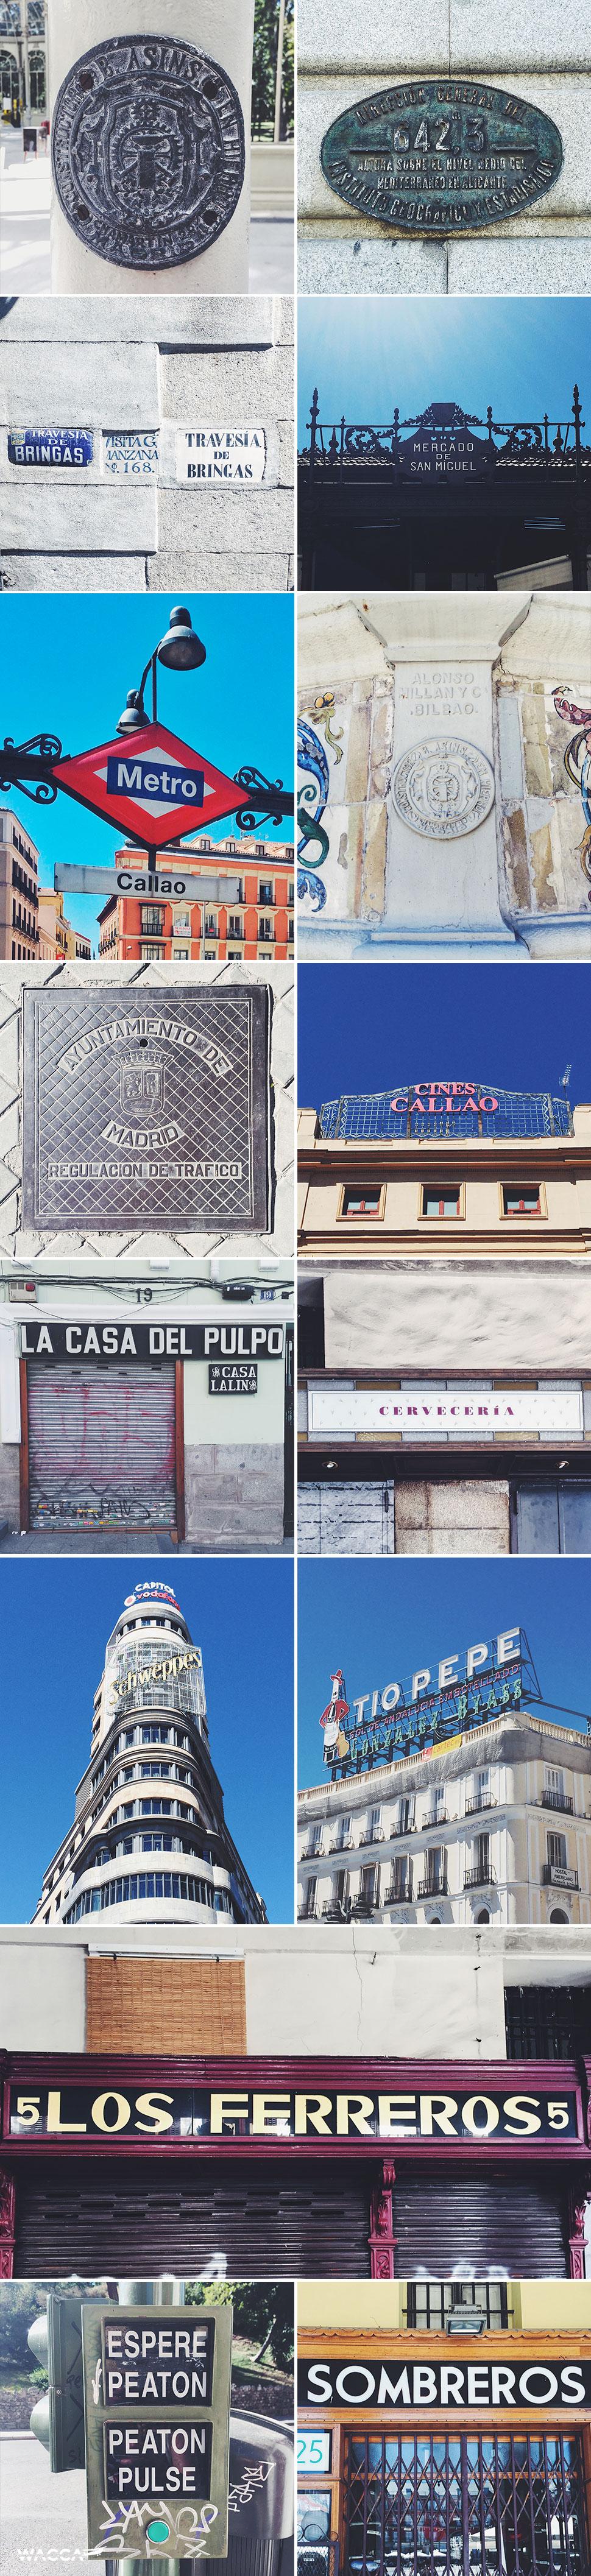 wacca-streettypography-madrid